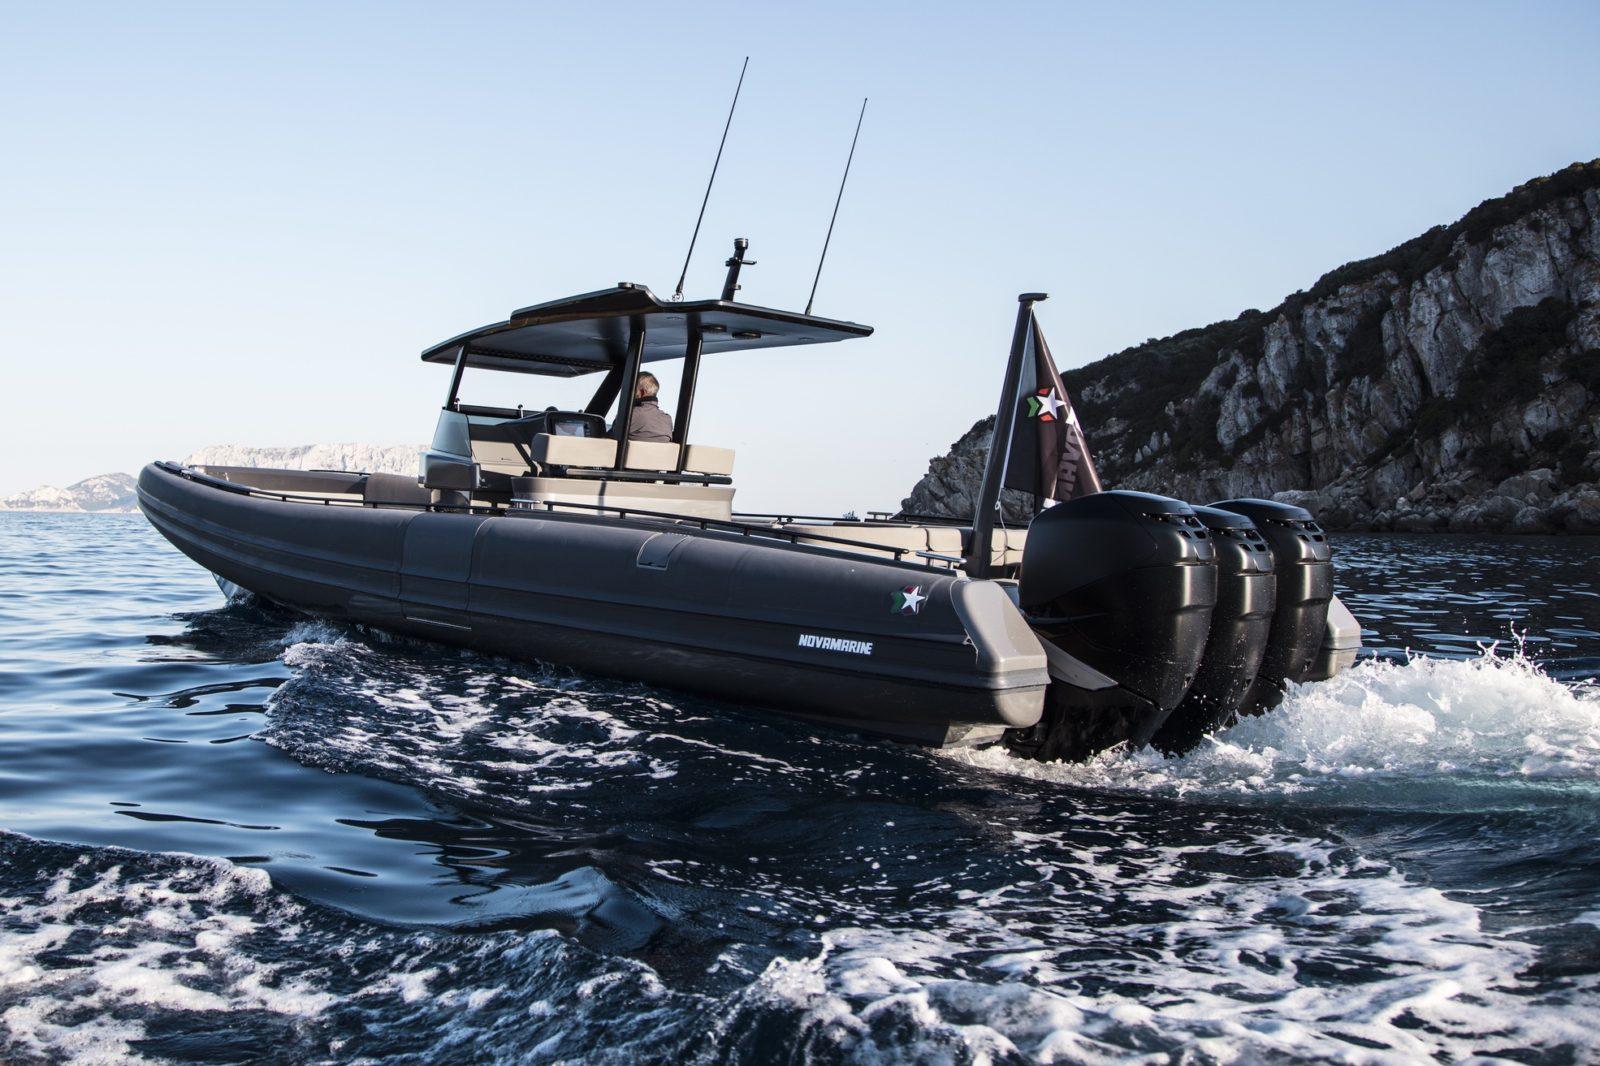 Luxury yacht for Sale | Black Shiver 120 (New) w/ Mercury Racing by Novamarine